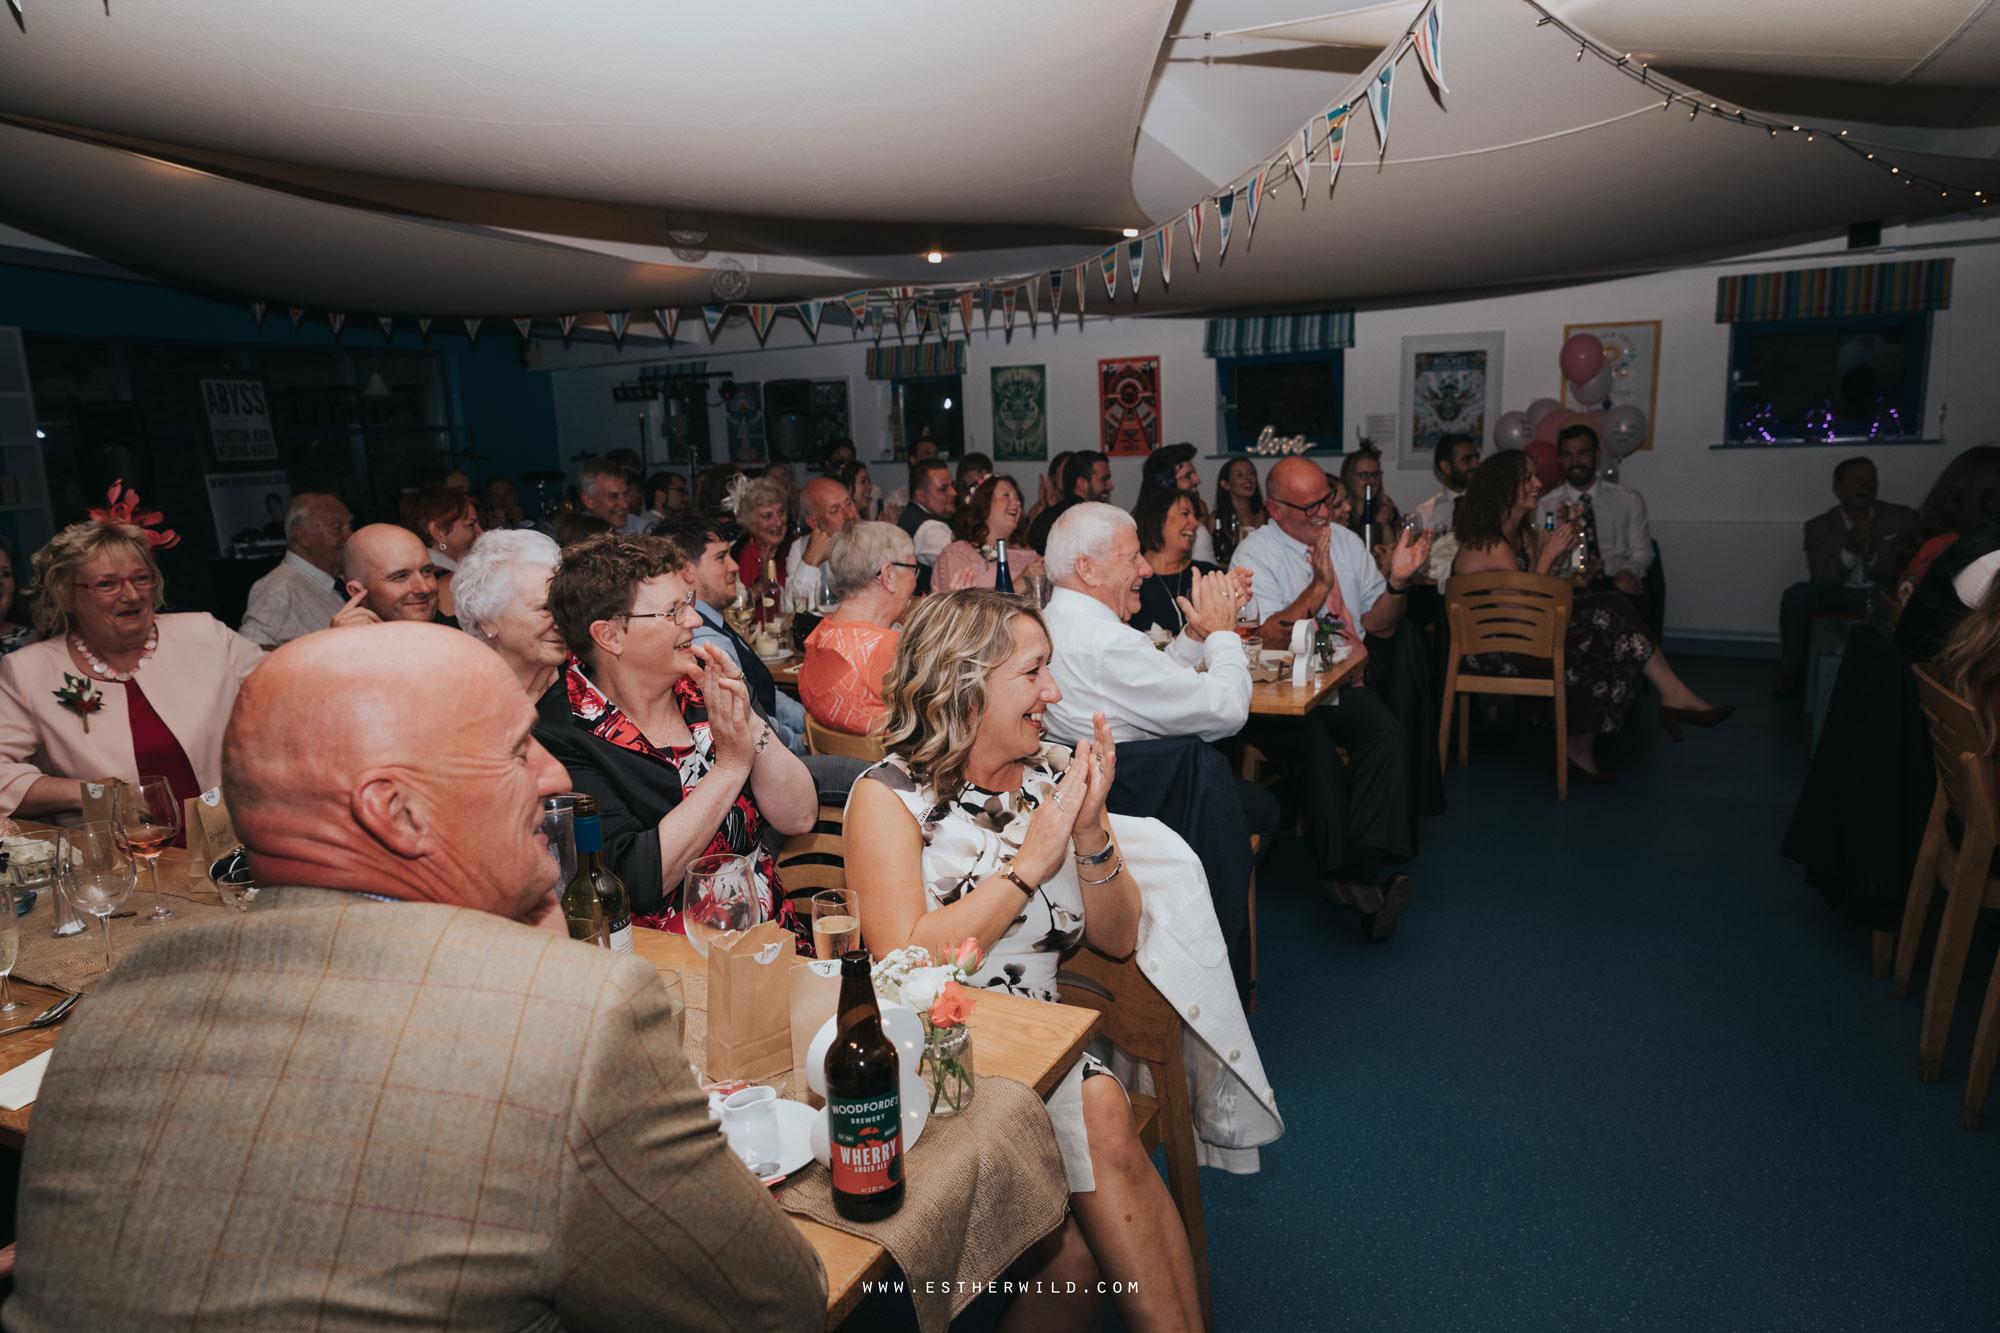 Cromer_Wedding_Beach_Outdoor_Ceremony_Norfolk_North_Lodge_Registry_Office_Rocket_House_Cafe_Cromer_Pier_IMG_5315.jpg